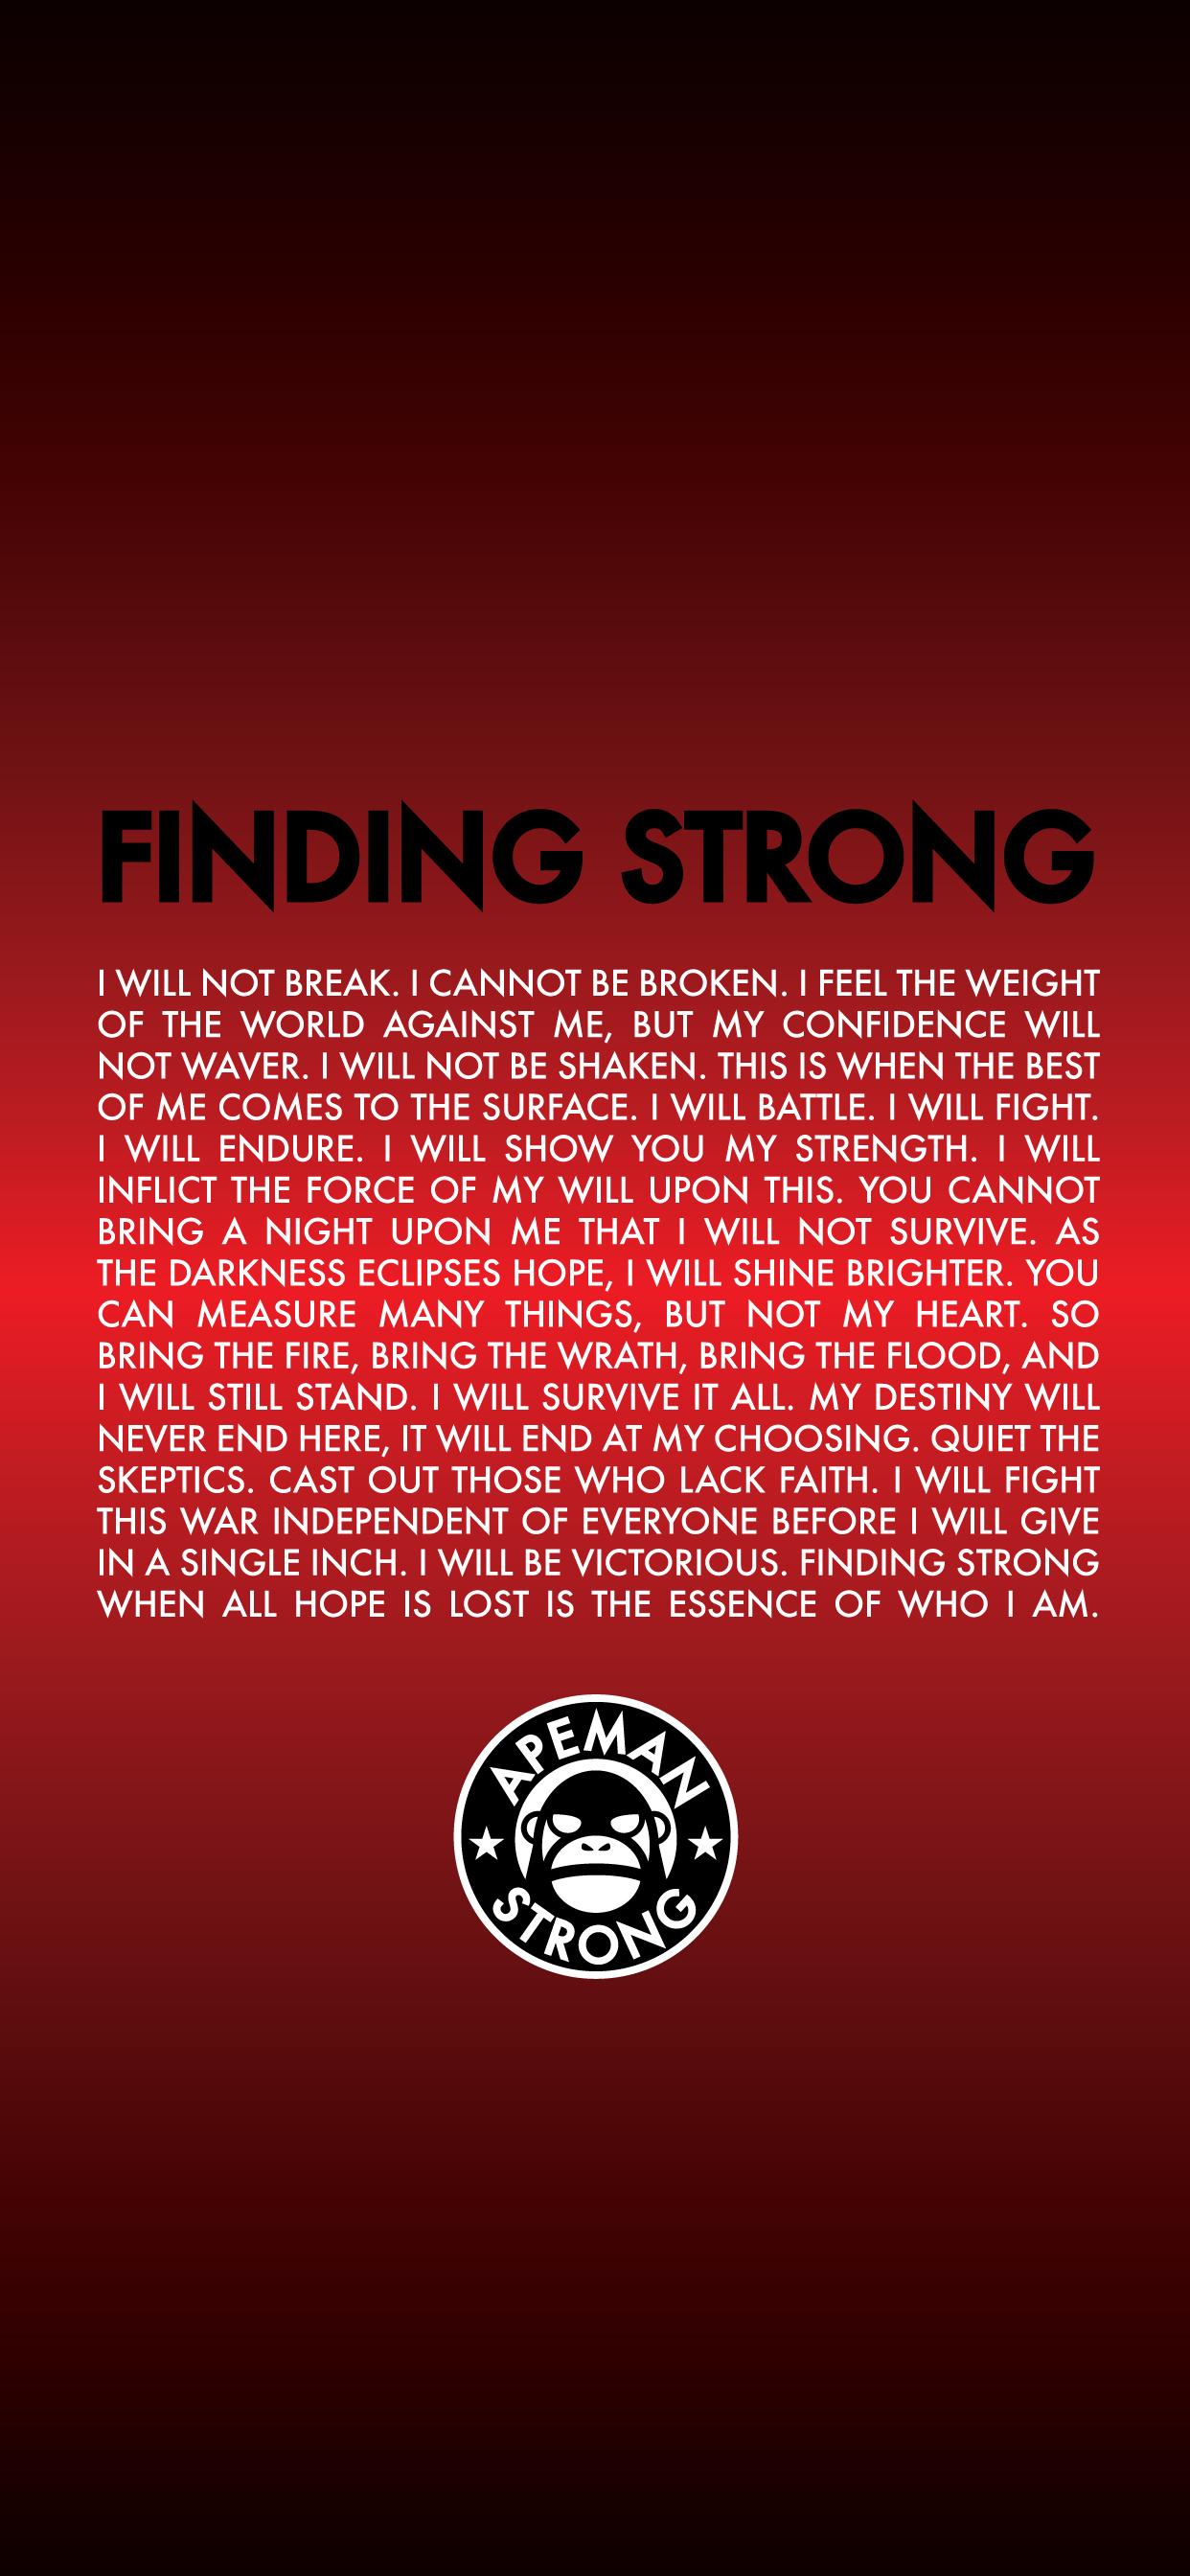 FINDING-STRONG.jpg